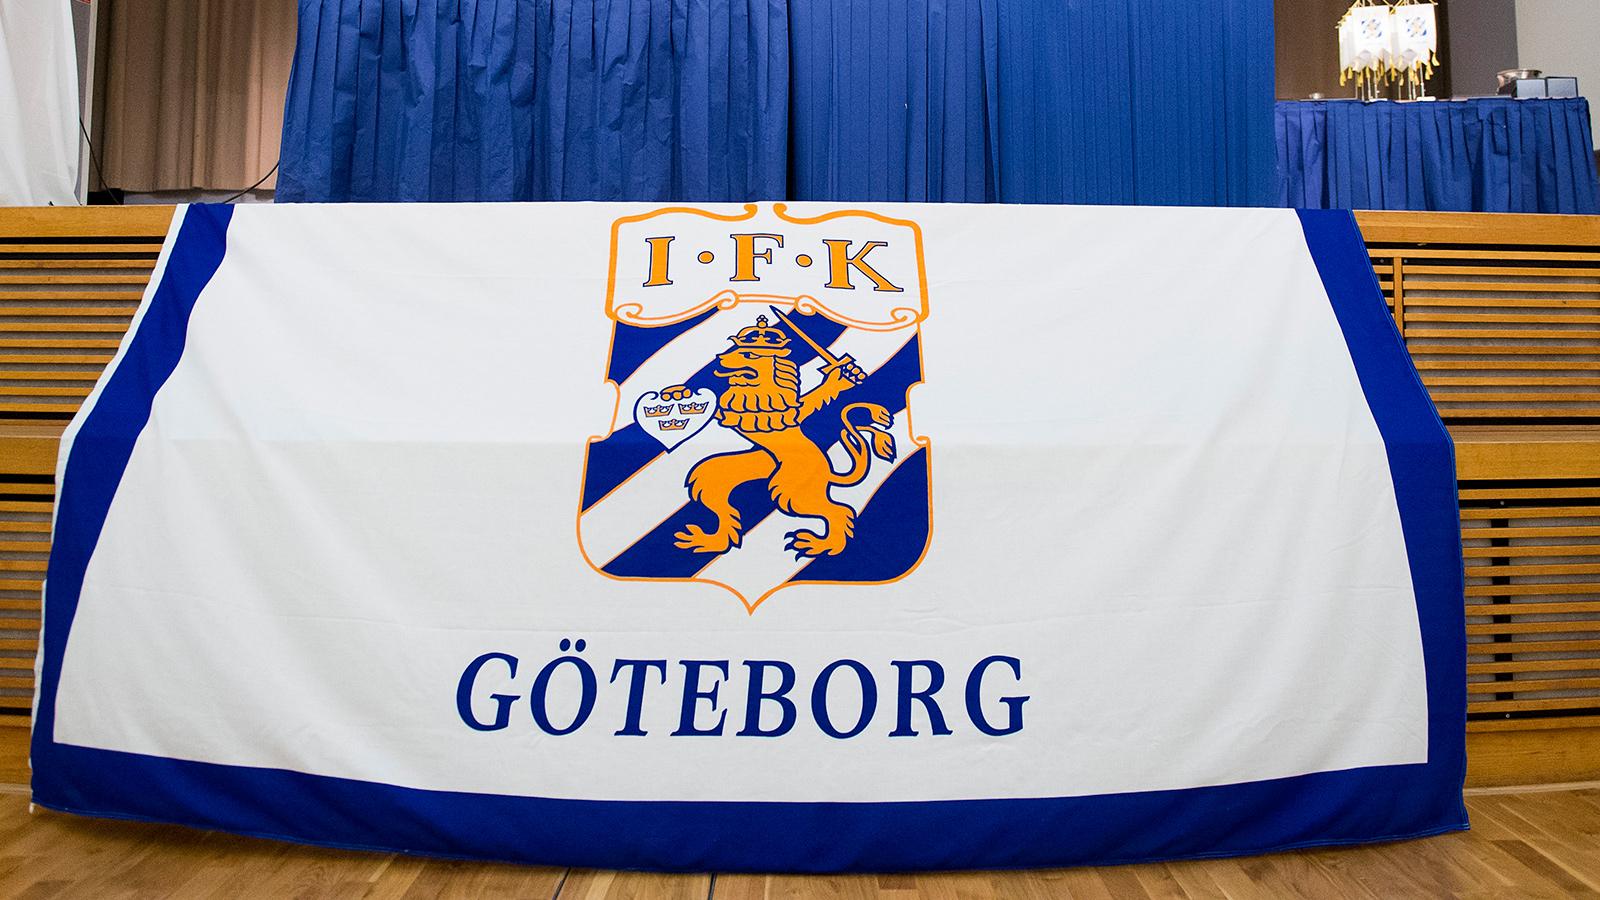 170306 Flagga under IFK Göteborgs årsmöte den 06 mars 2017 i Göteborg.